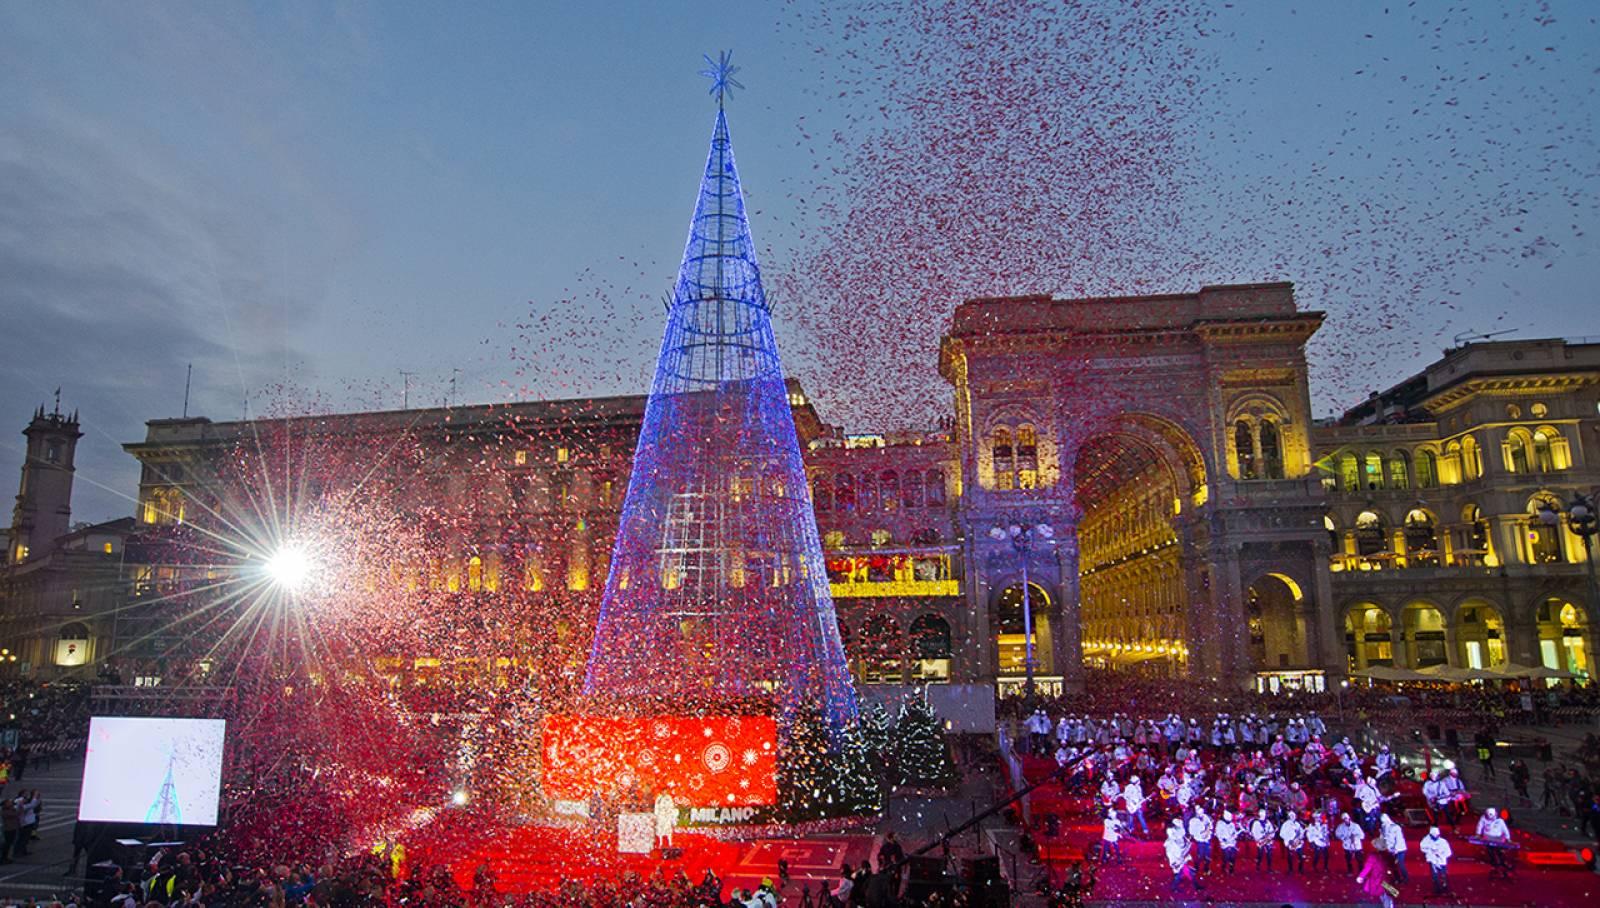 Inaugurazione Albero di Natale IGPDecaux per Esselunga Milano 2019